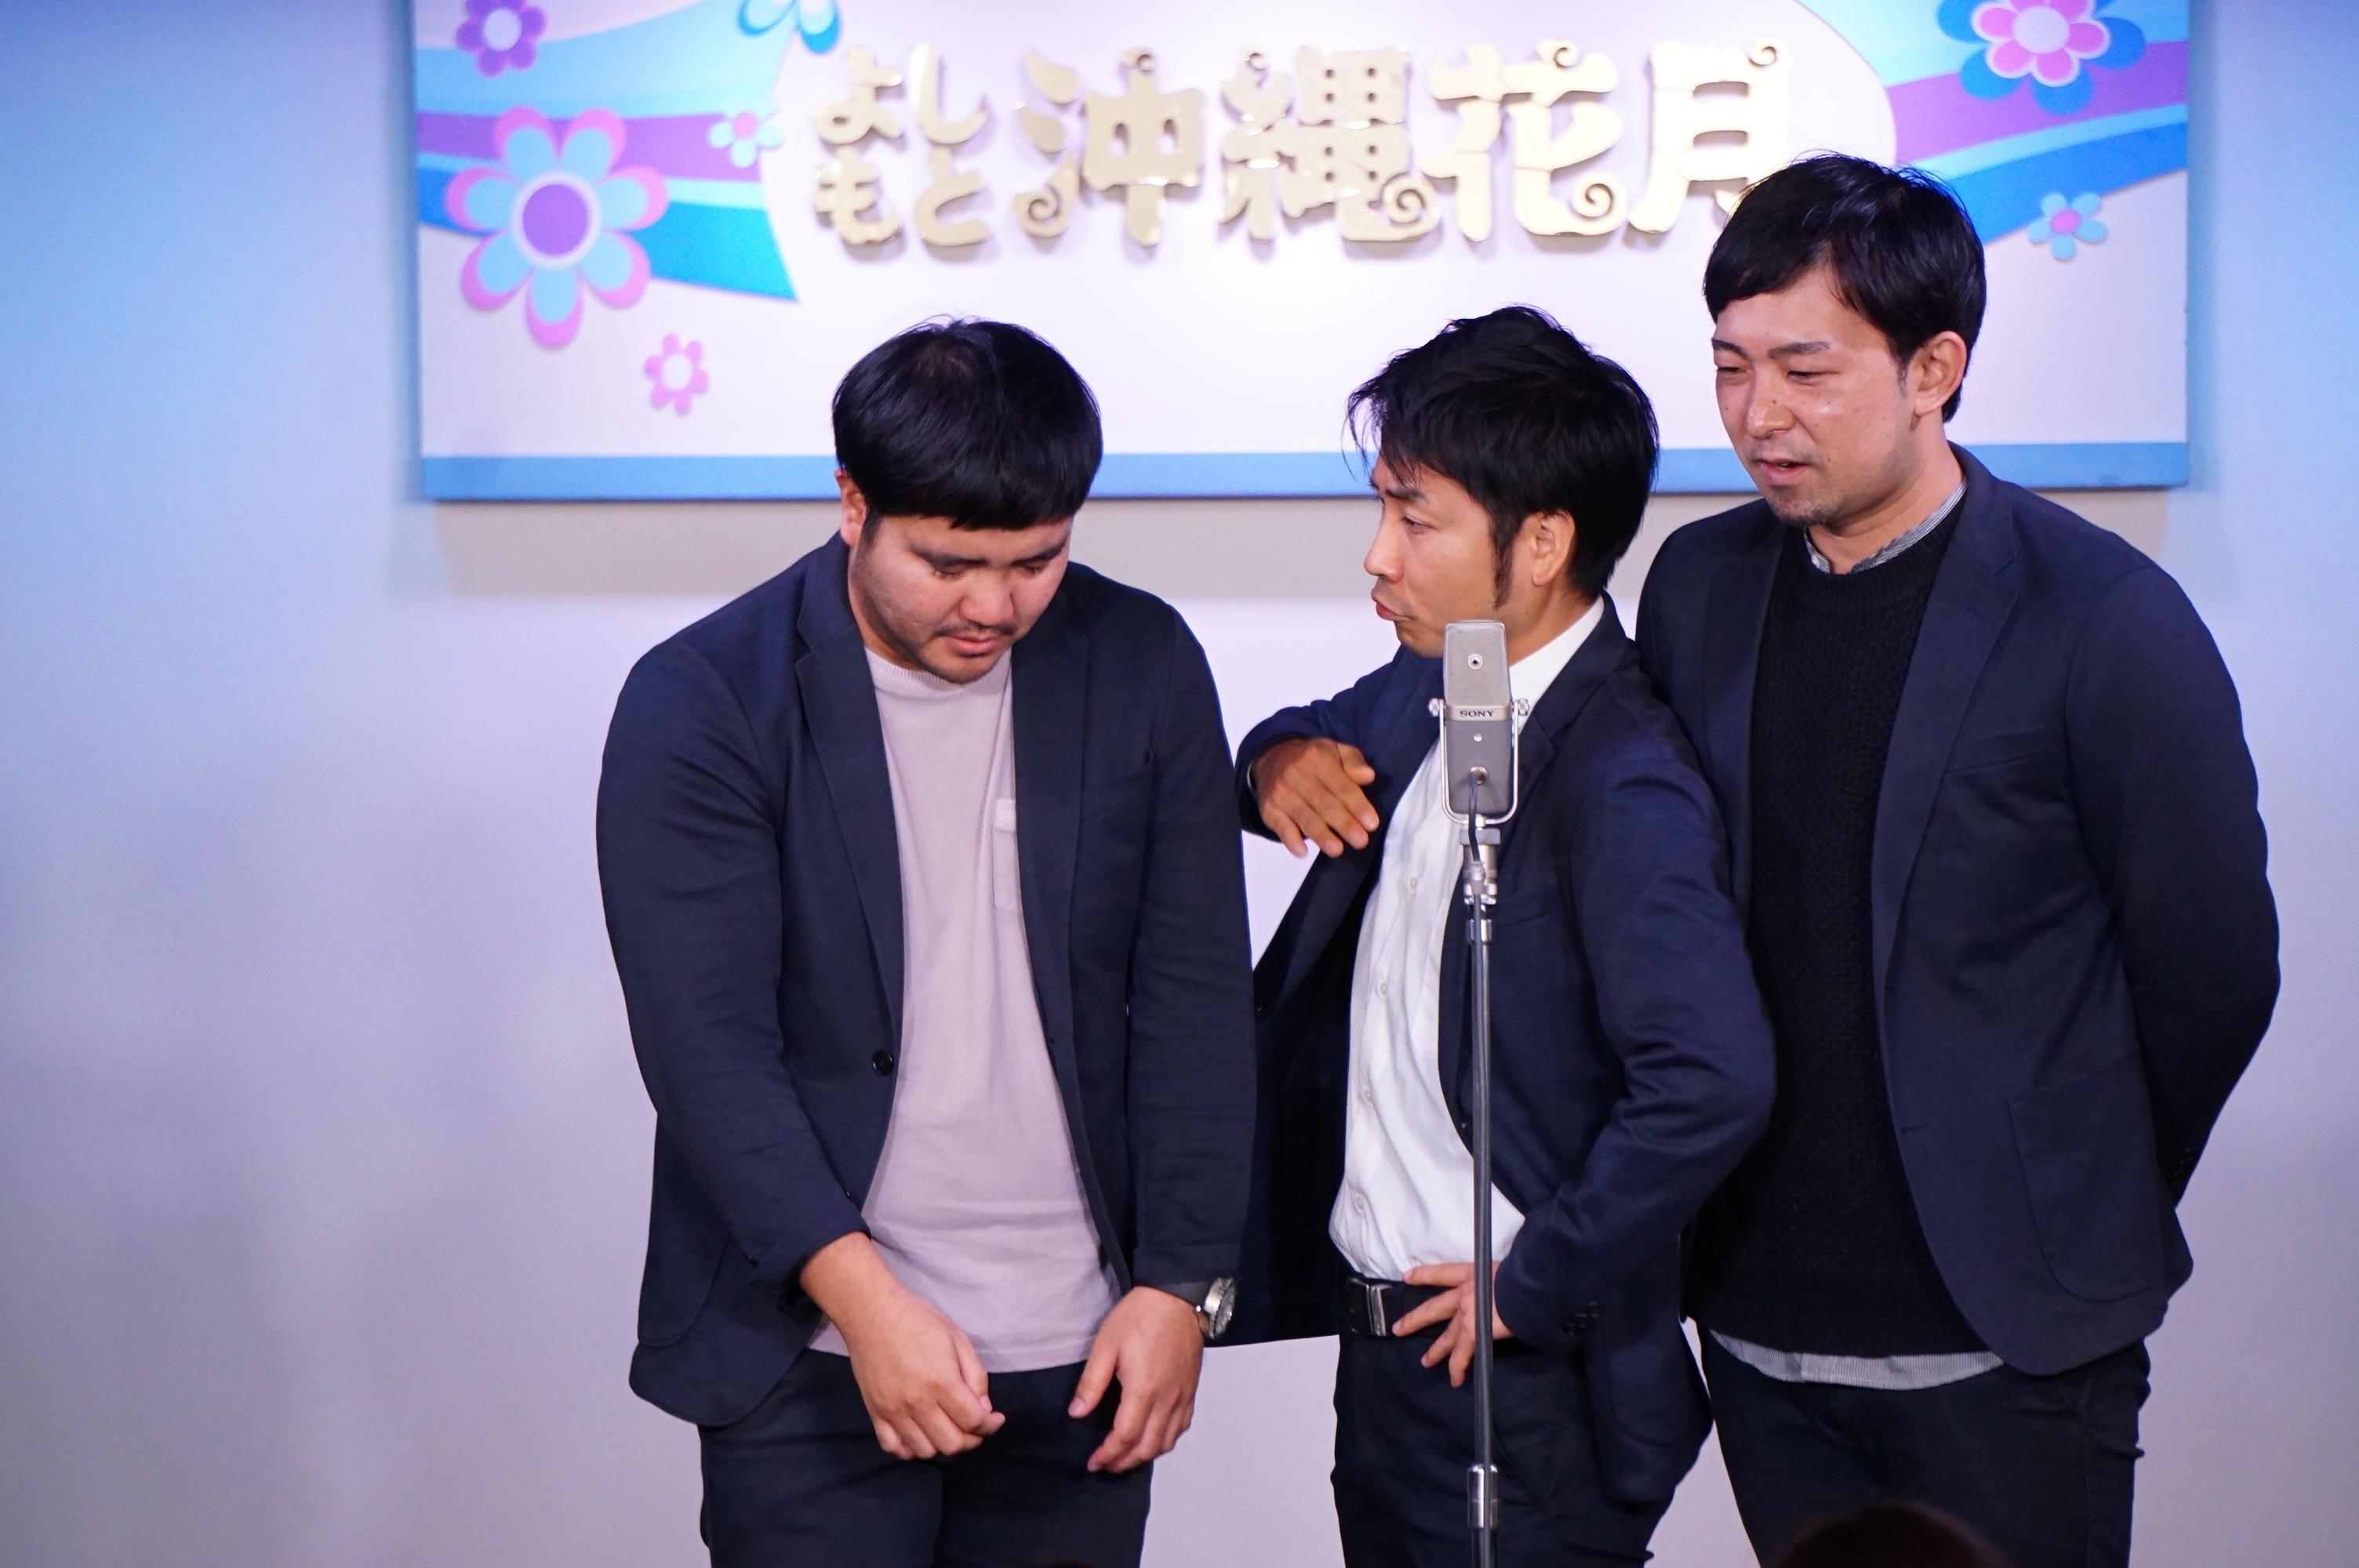 http://news.yoshimoto.co.jp/20180205140736-edaa45ced09c1be3321632ff2776bdbfd723fff7.jpg